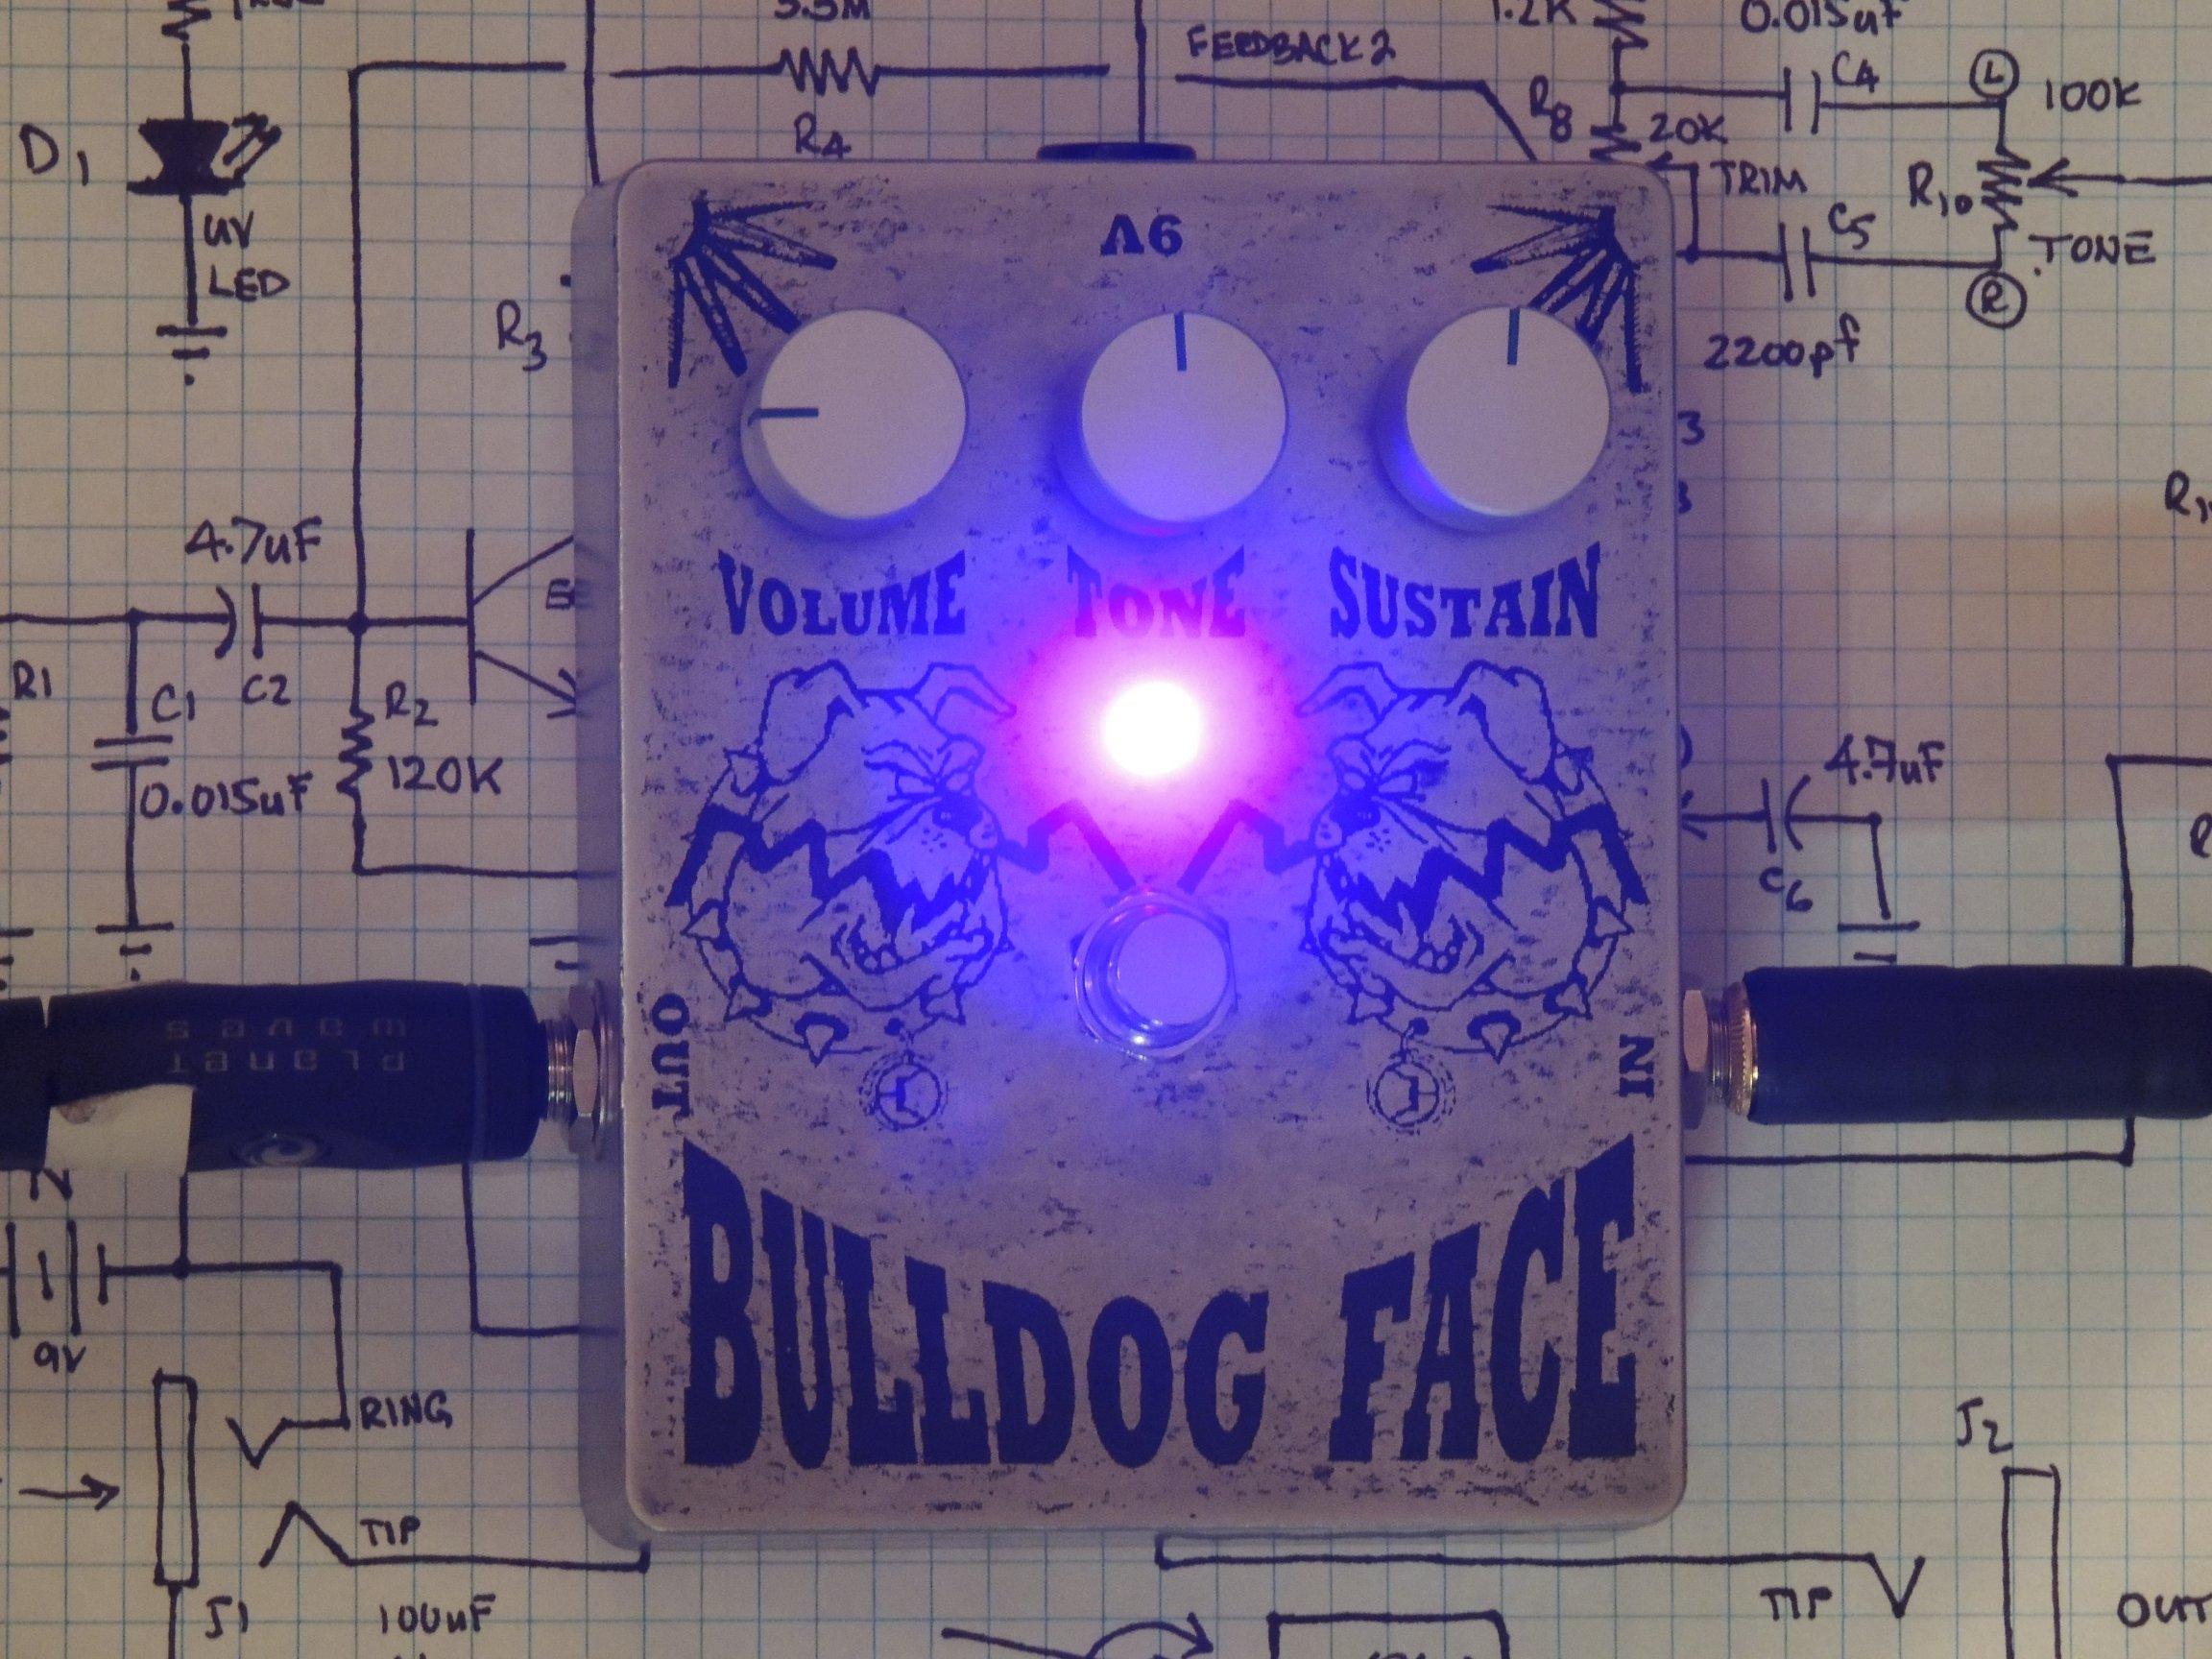 The Bulldog Face Distortion Pedal DIY